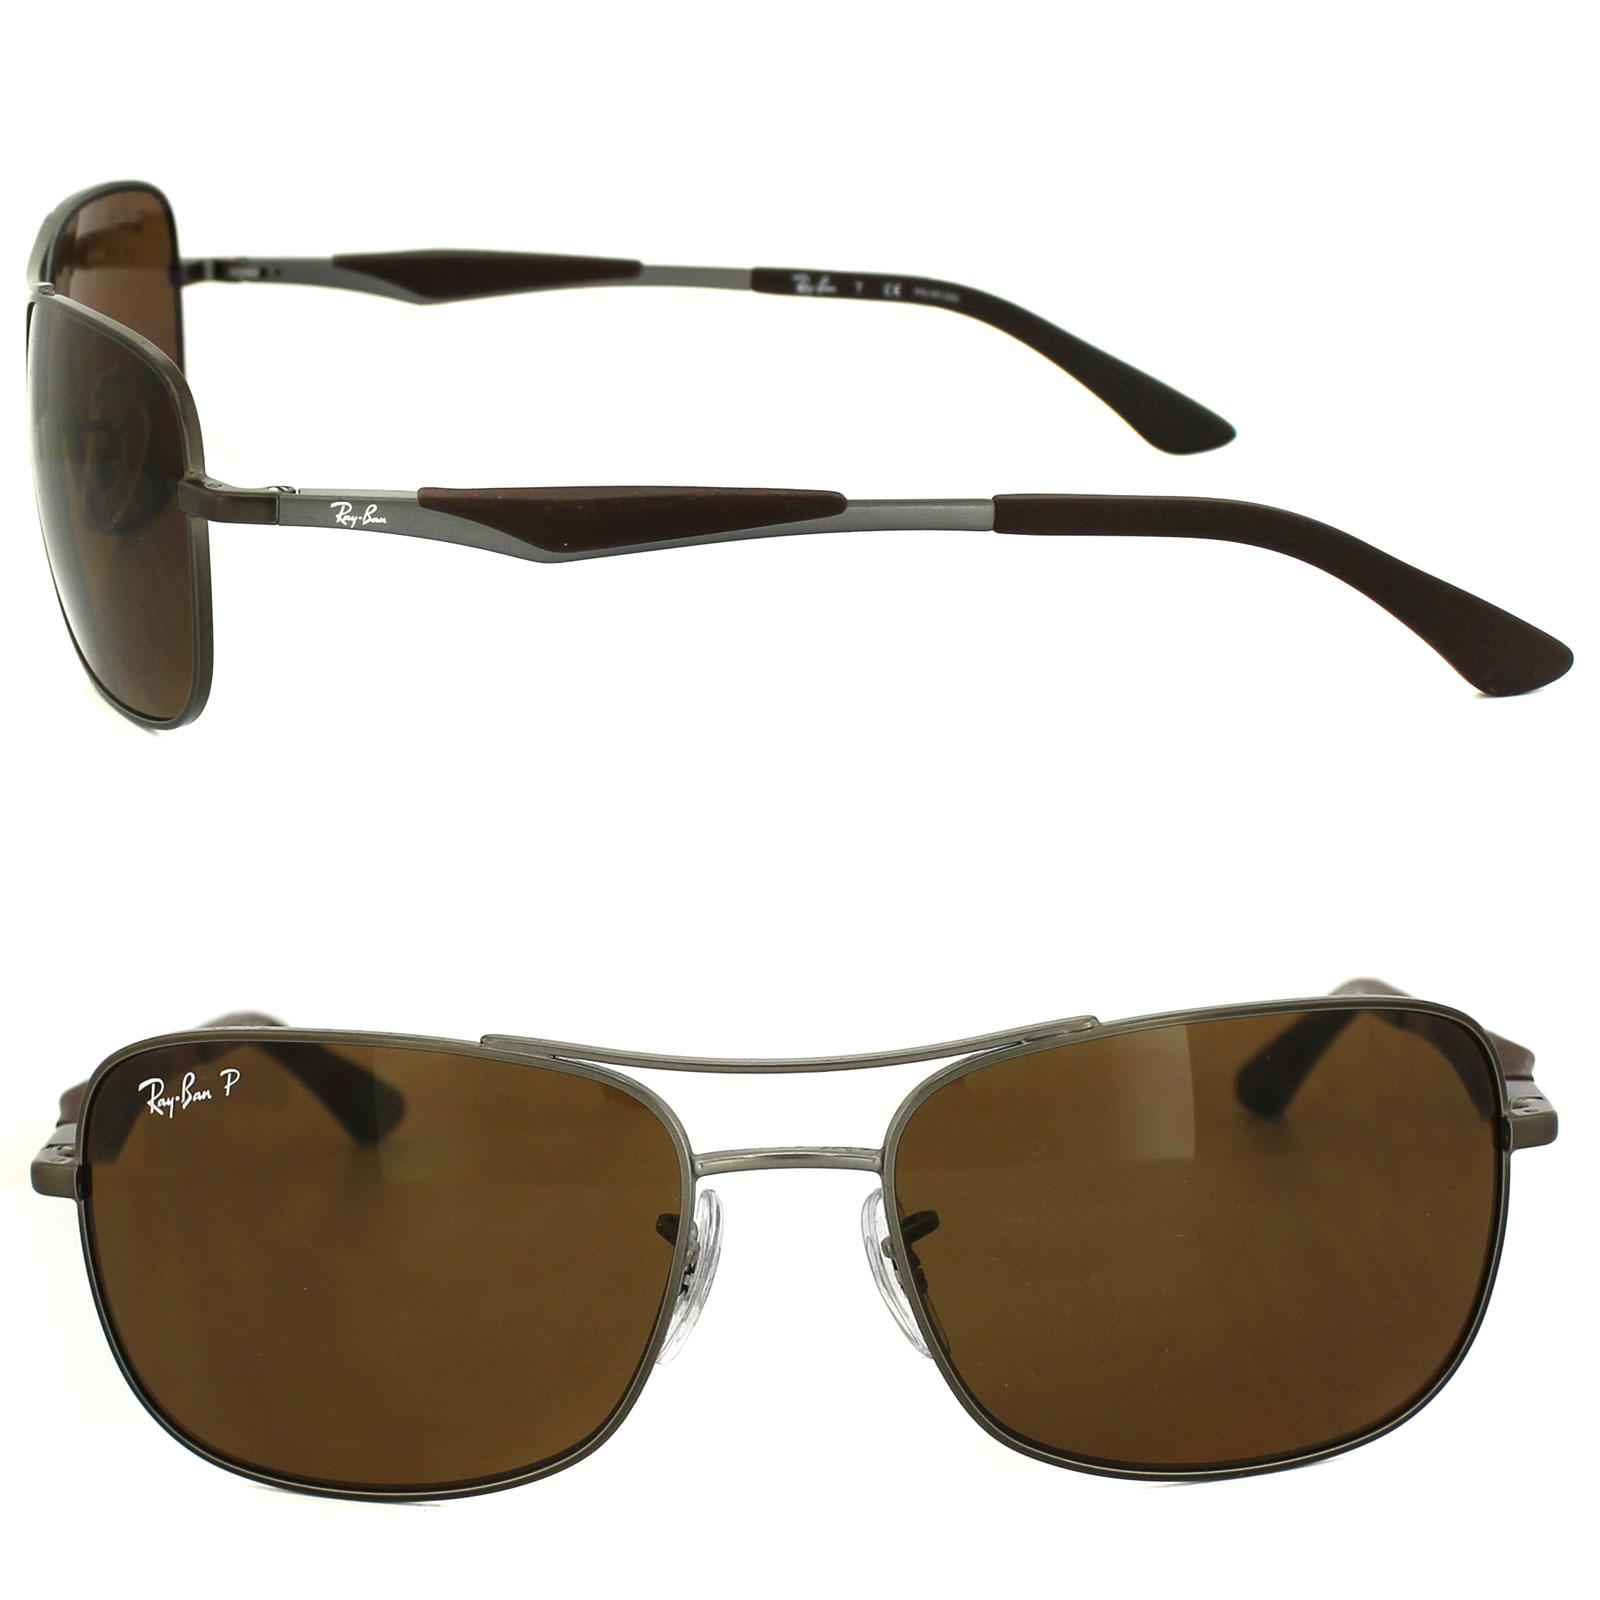 c4e1d0428f Sentinel Ray-Ban Sunglasses 3515 029 83 Matt Gunmetal Brown Polarized